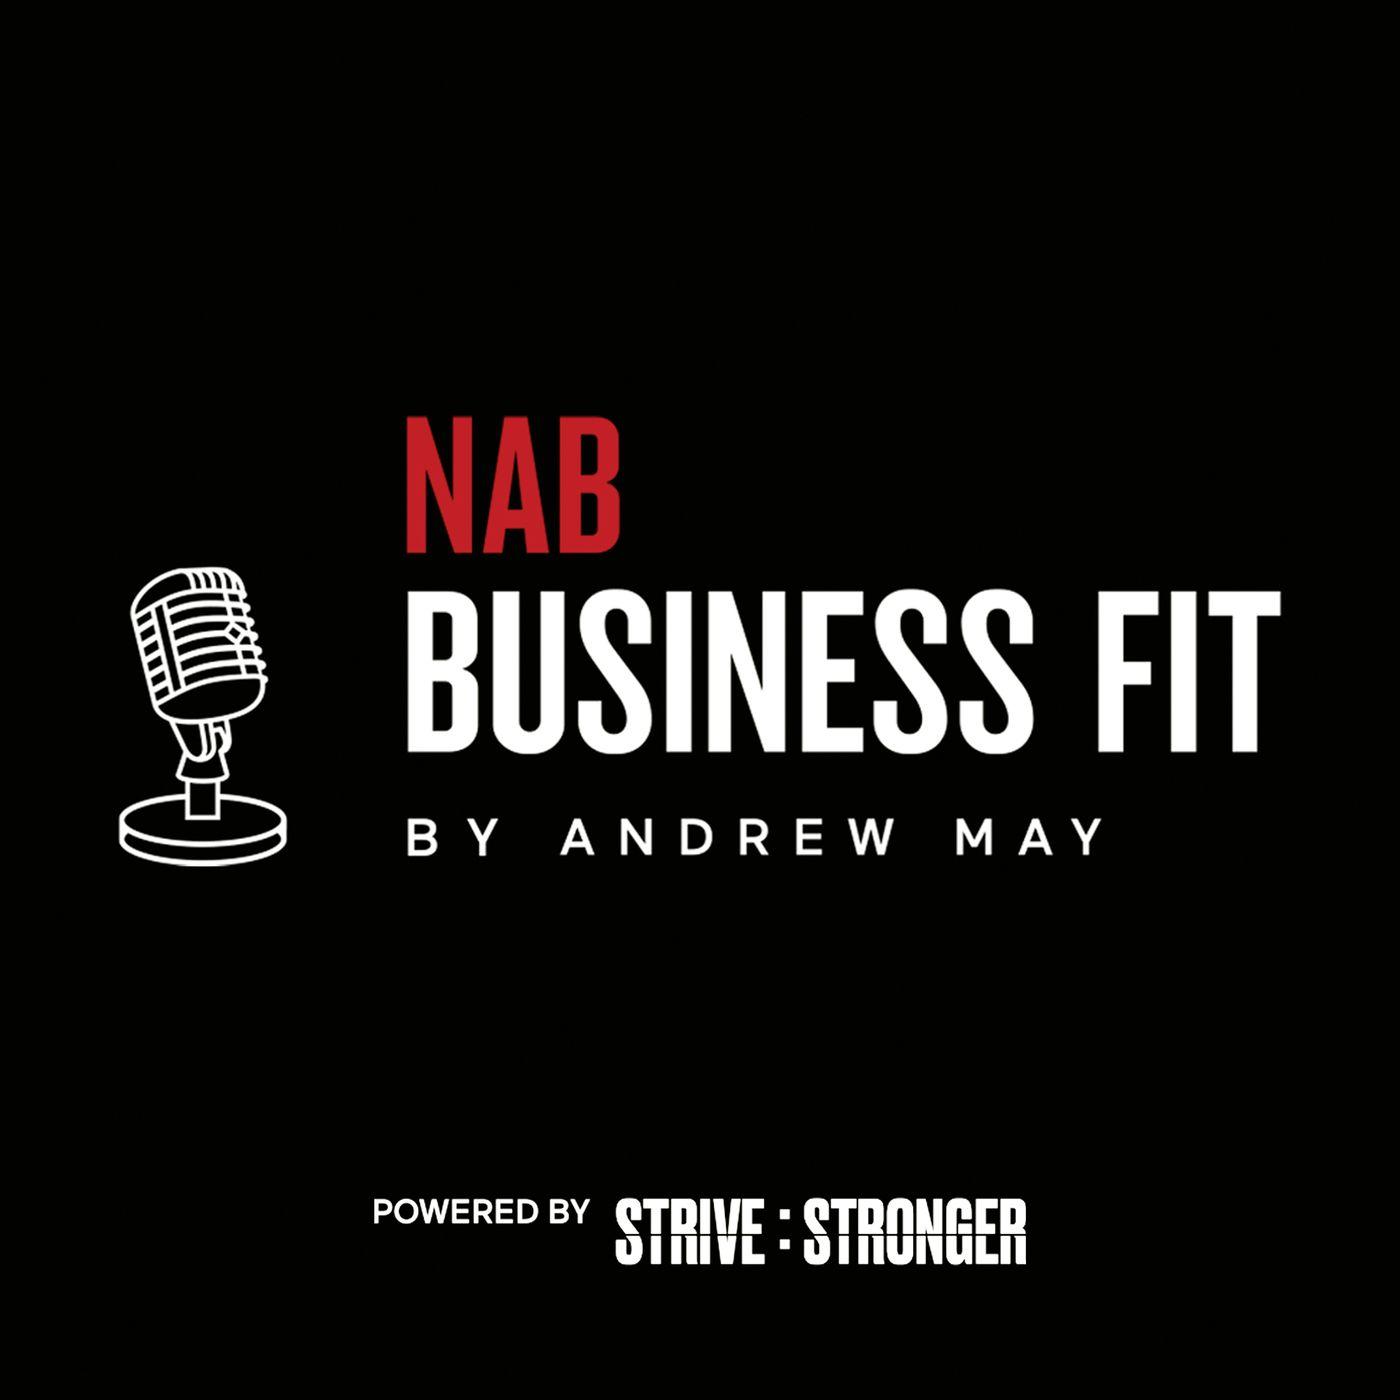 NAB Business Fit